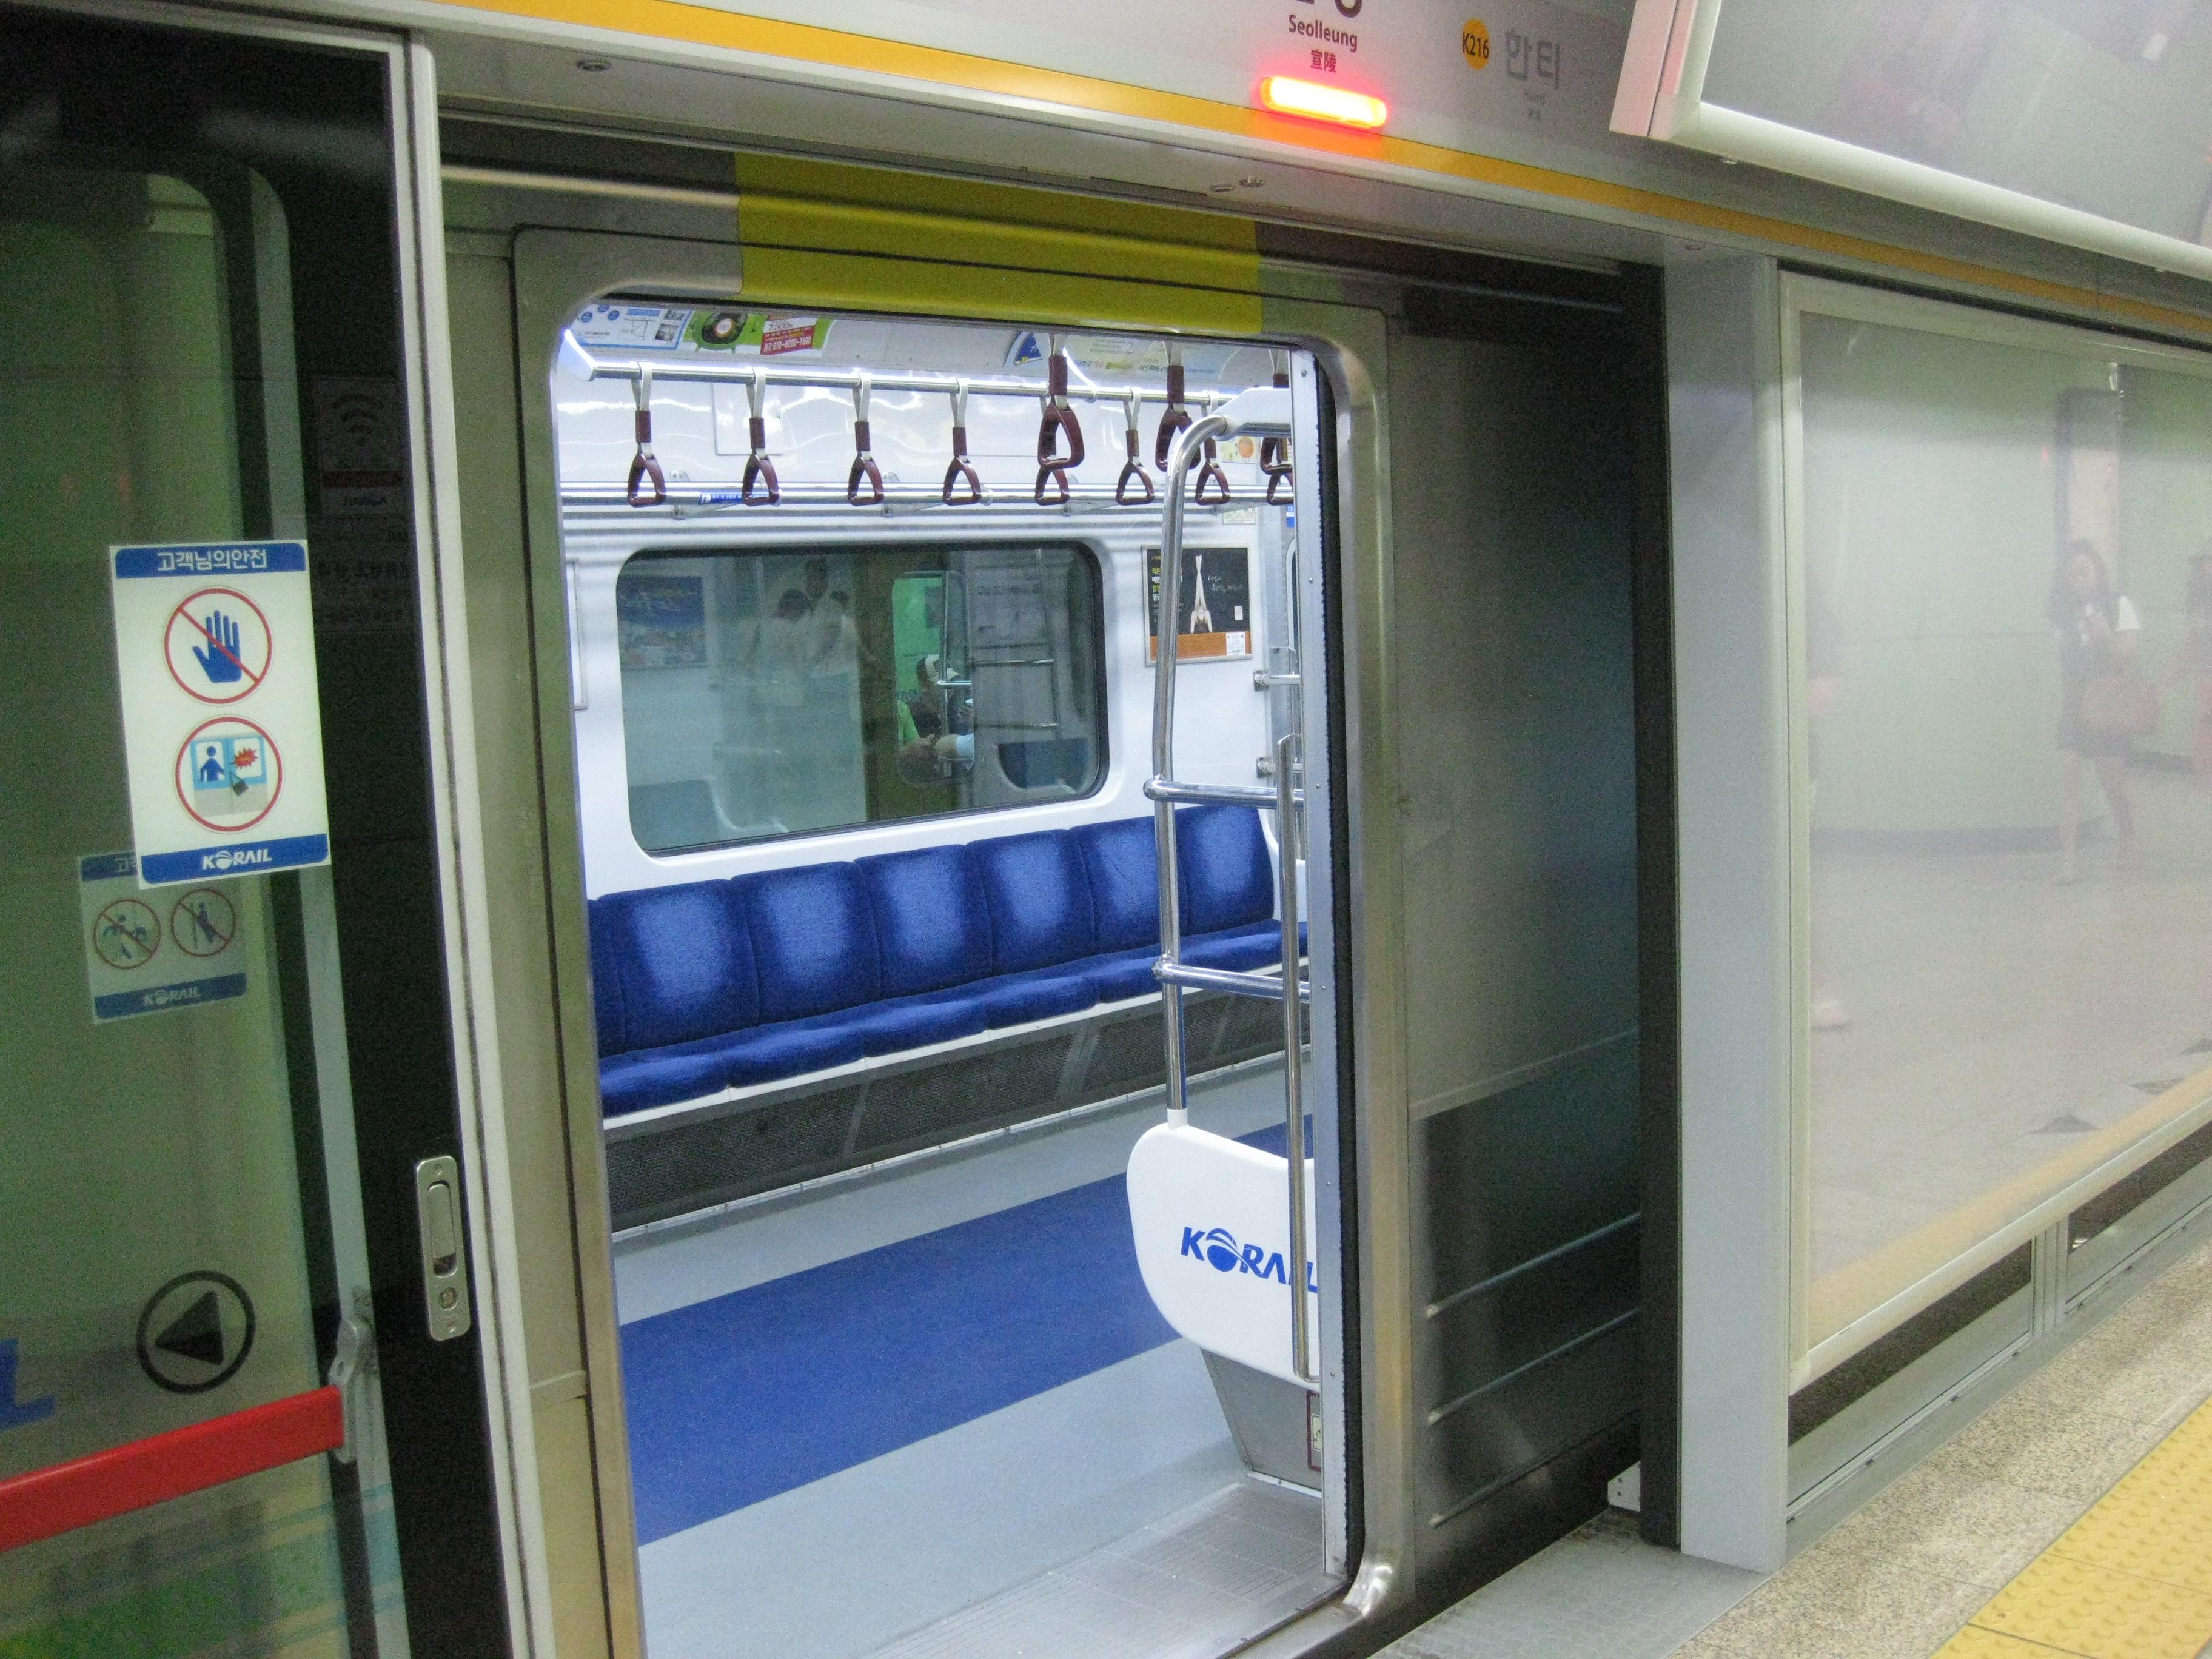 Audio Player & 203 u2013 Train Door Closing: Bundang Line | Seoul Sounds / ?? ???